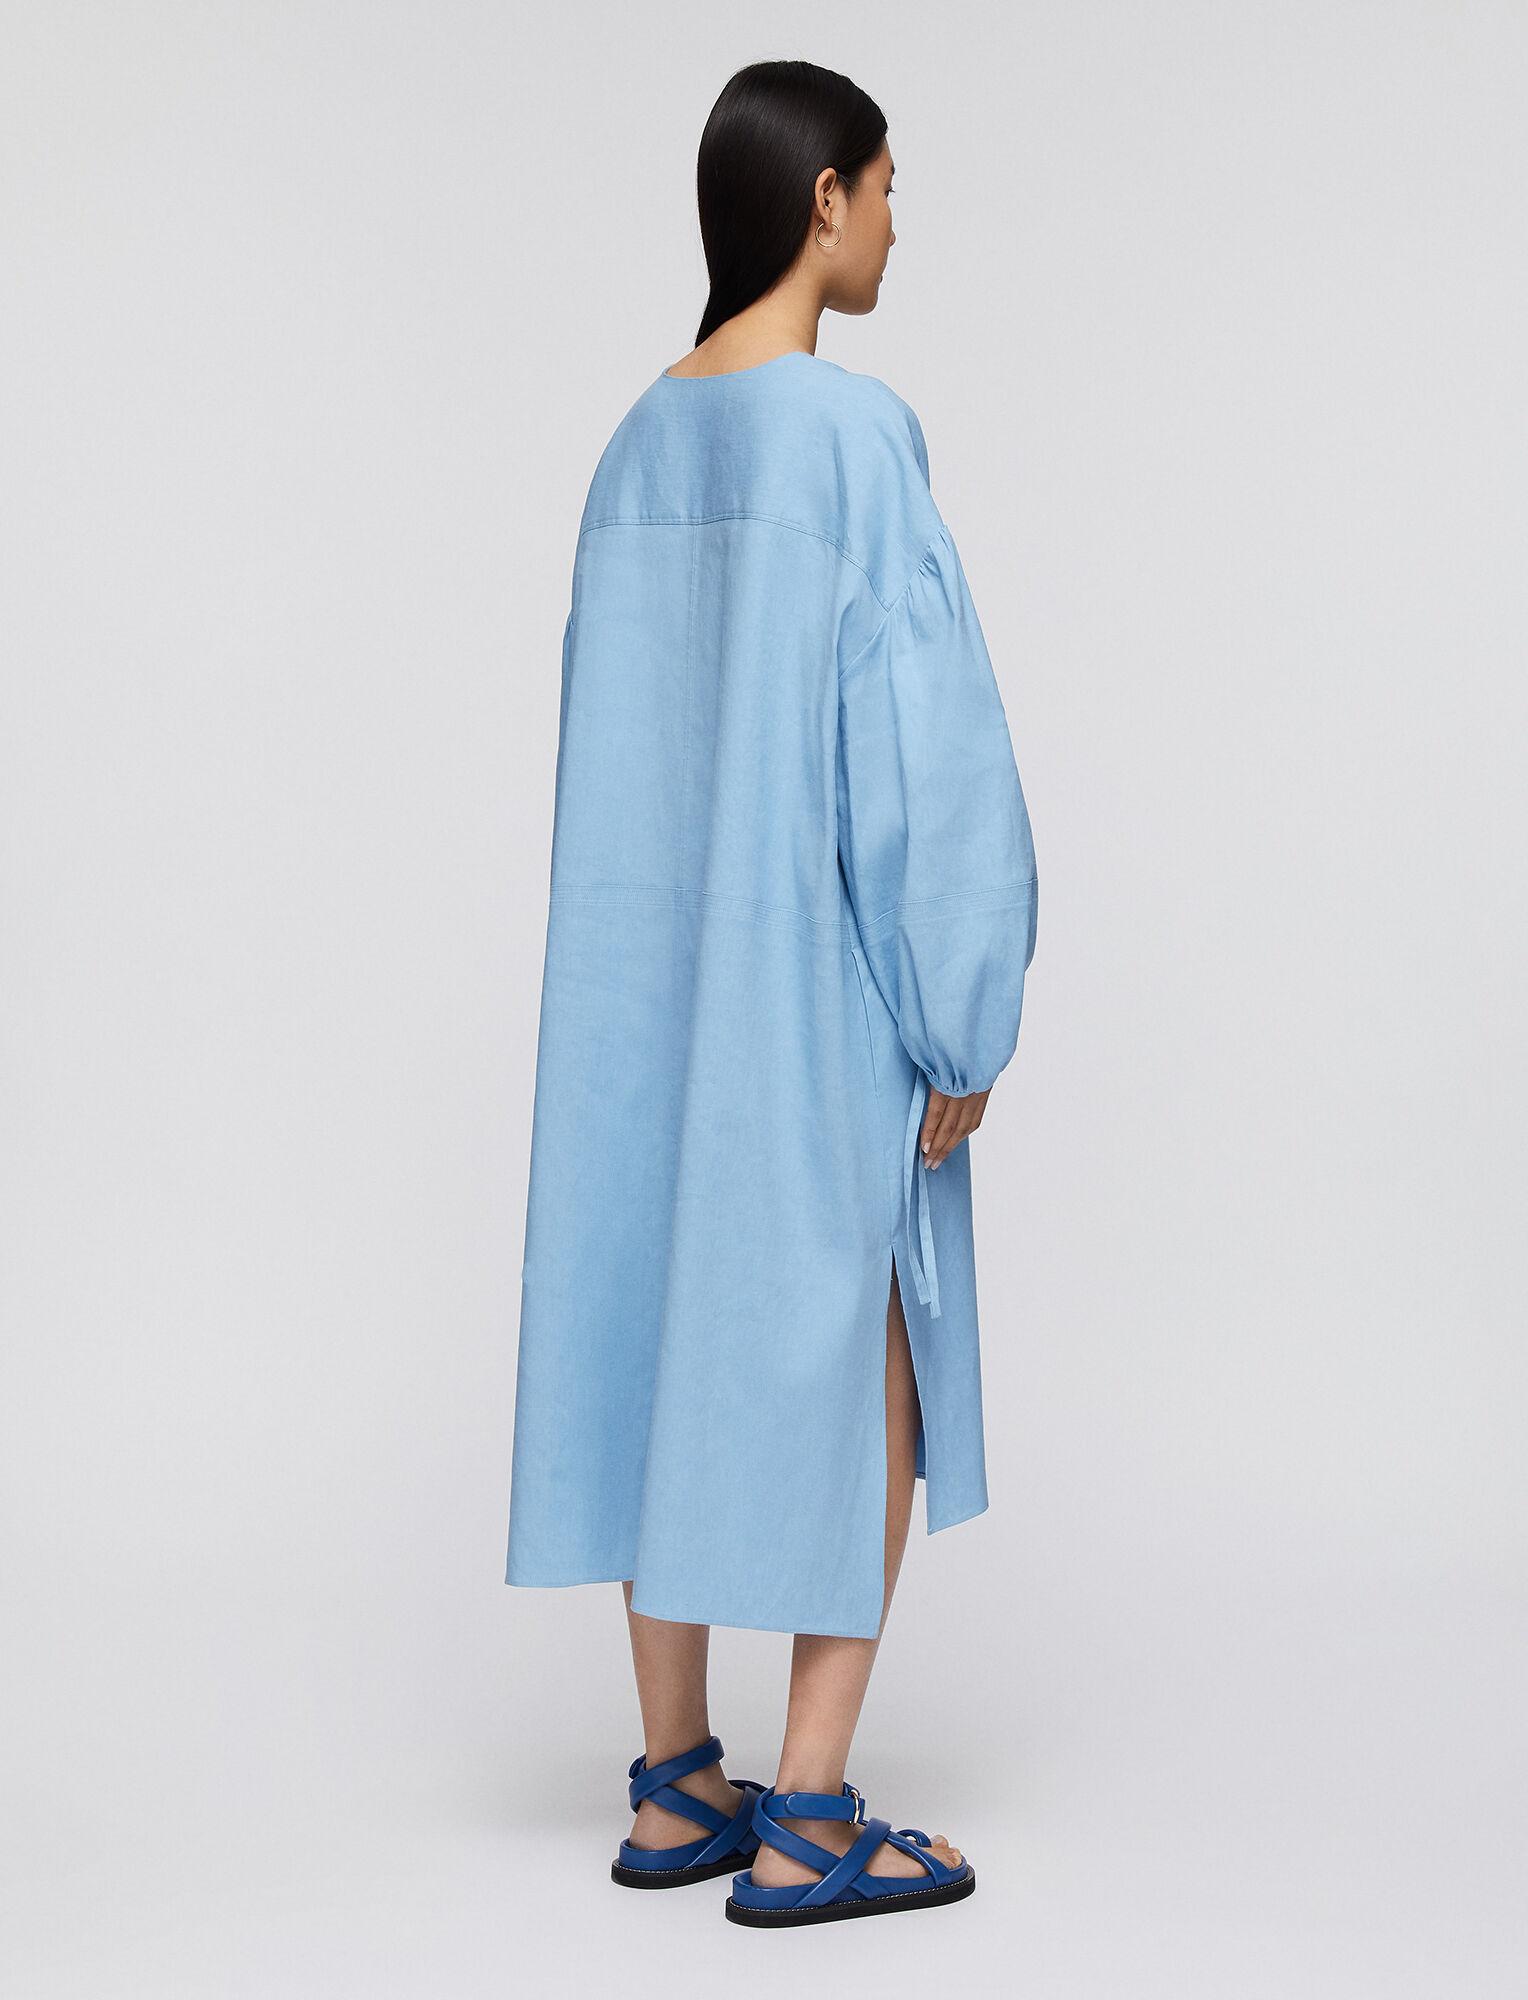 Joseph, Stretch Linen Cotton Duna Dress, in CERULEAN